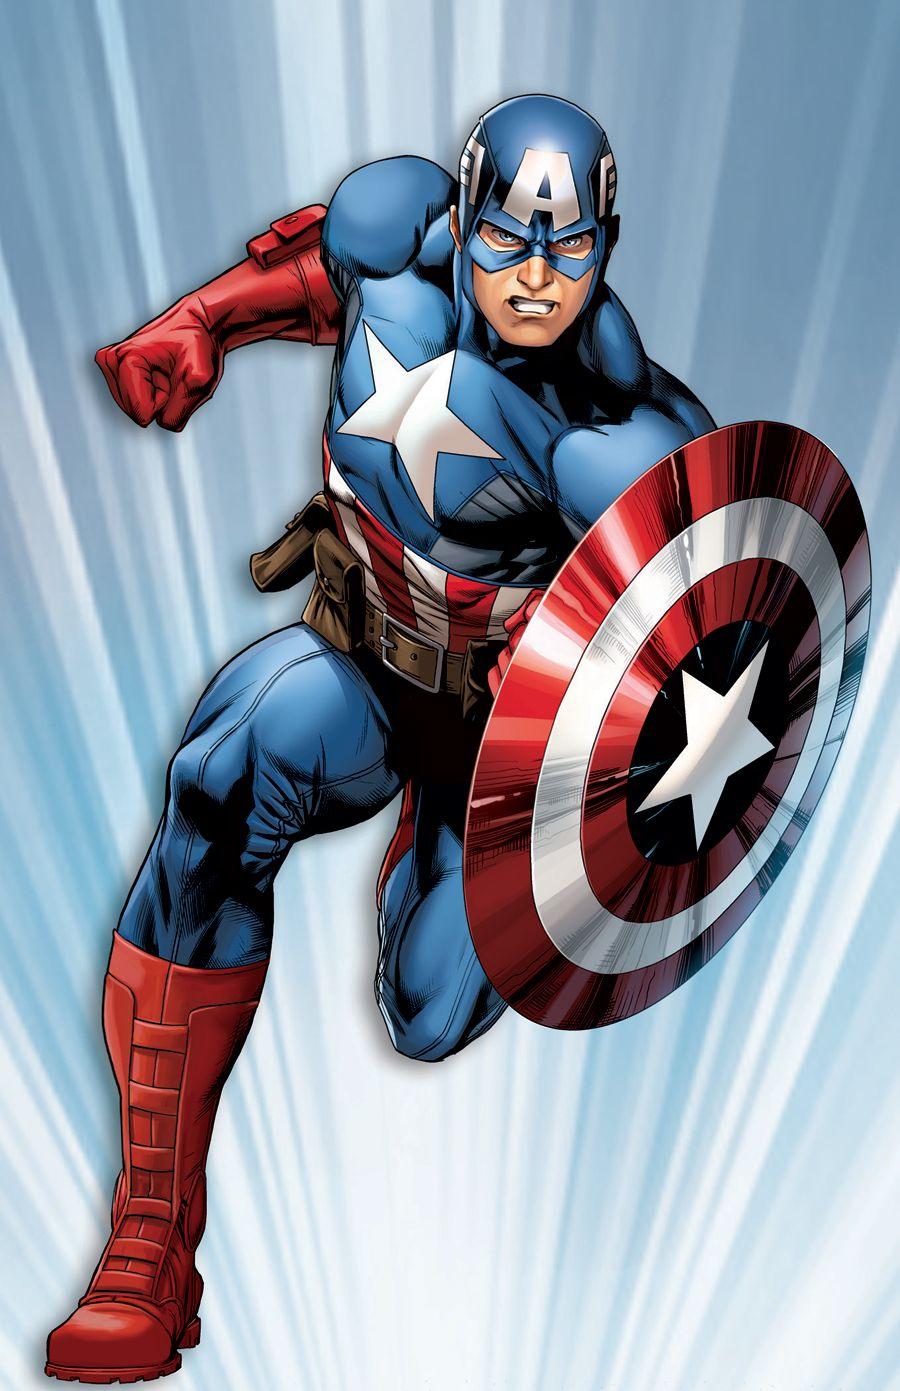 Pin de topher en Captain America | Pinterest | América y Dibujo